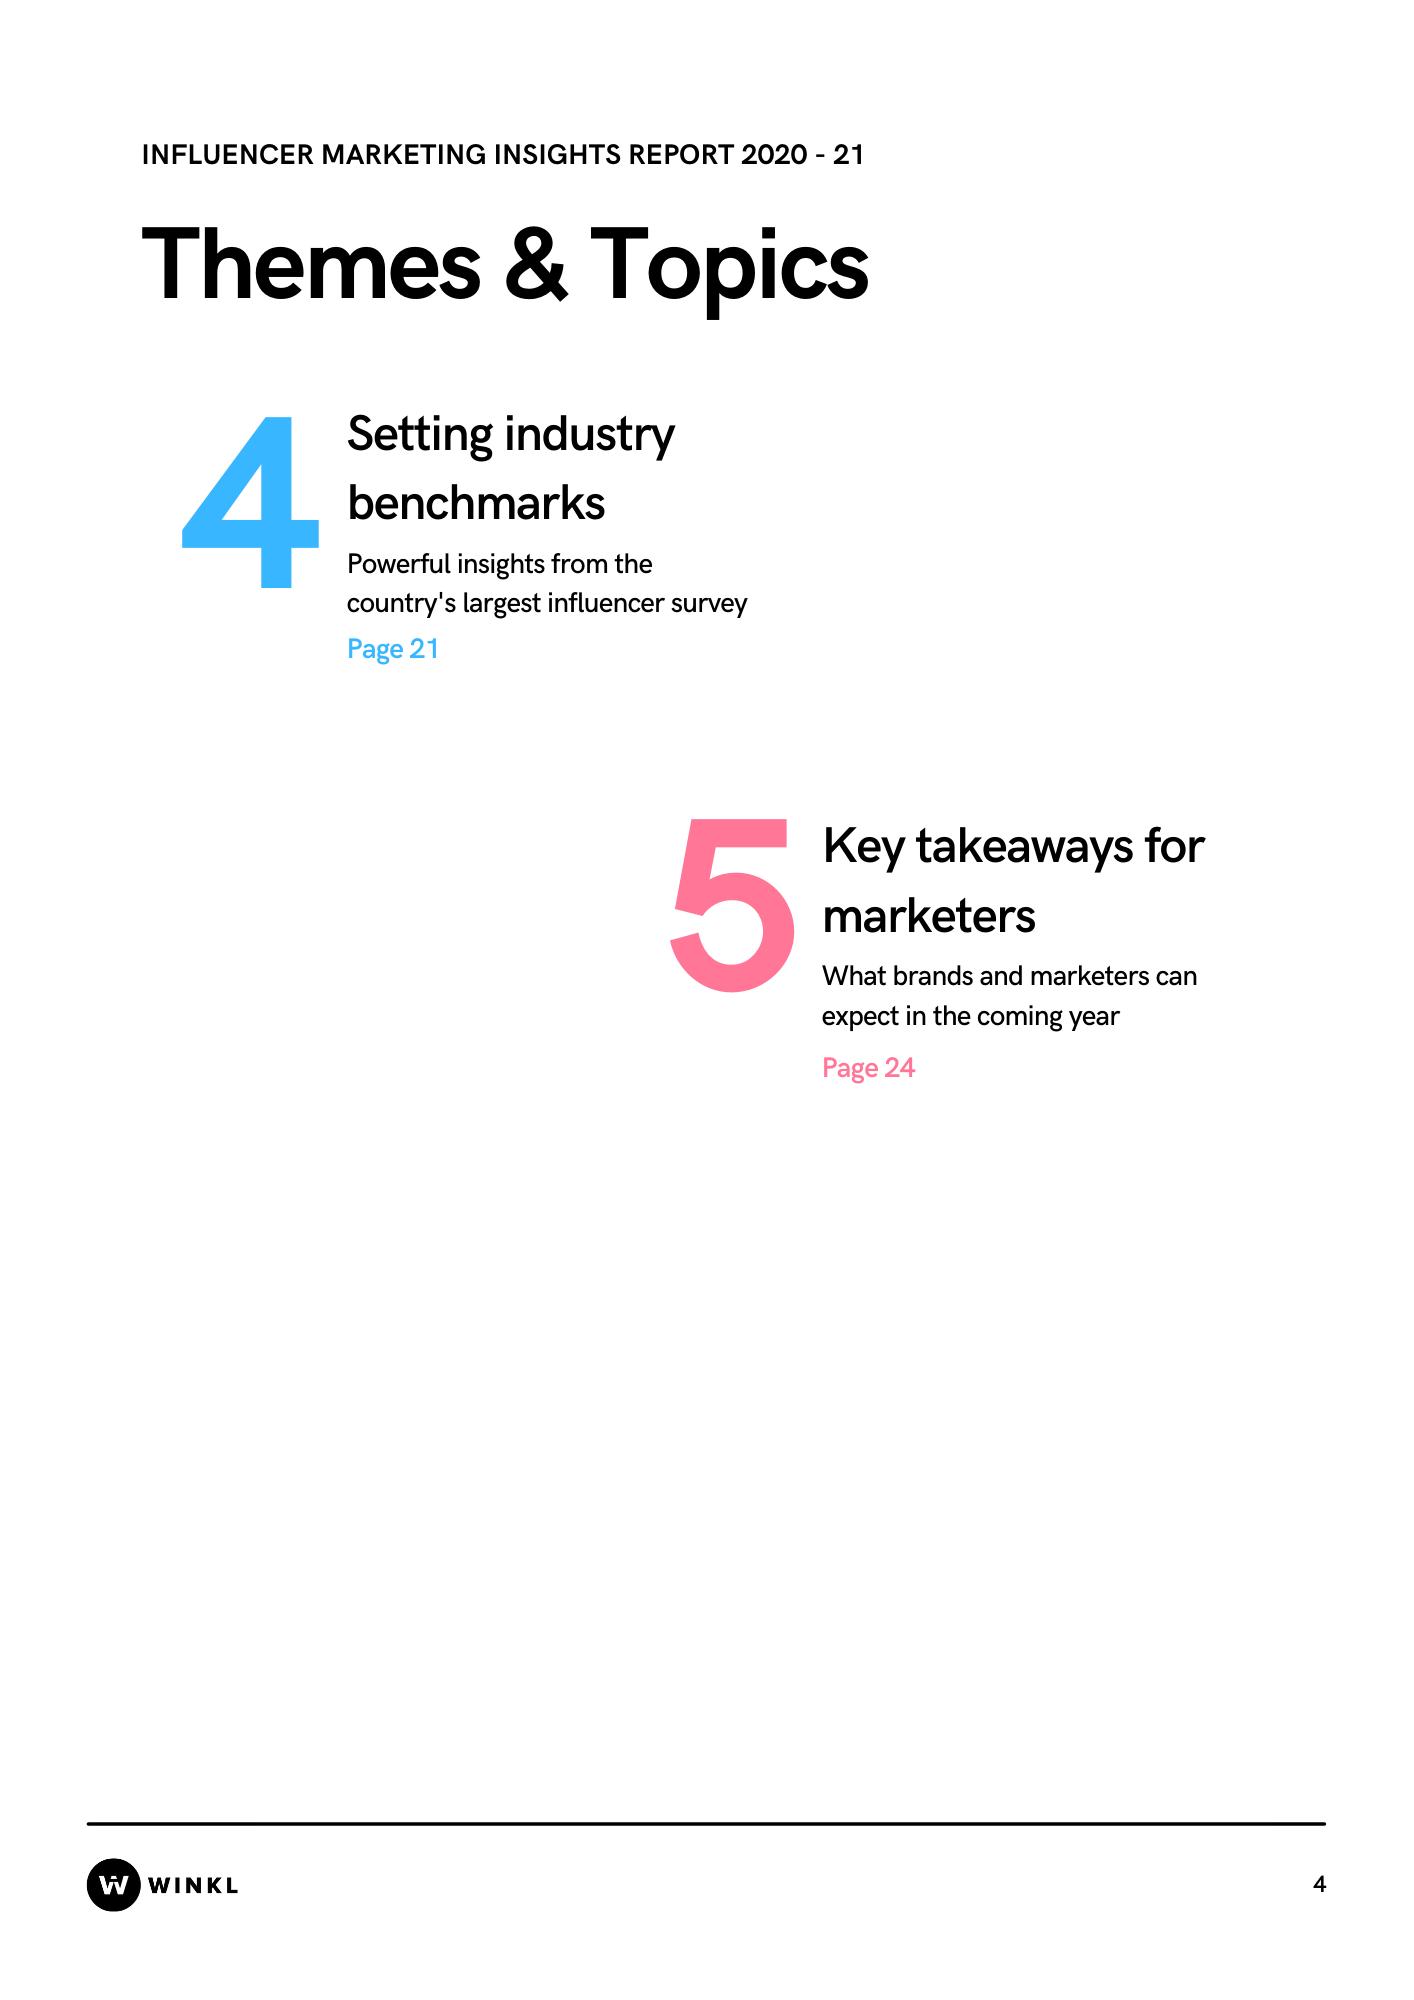 Influencer marketing insights report 2020-21